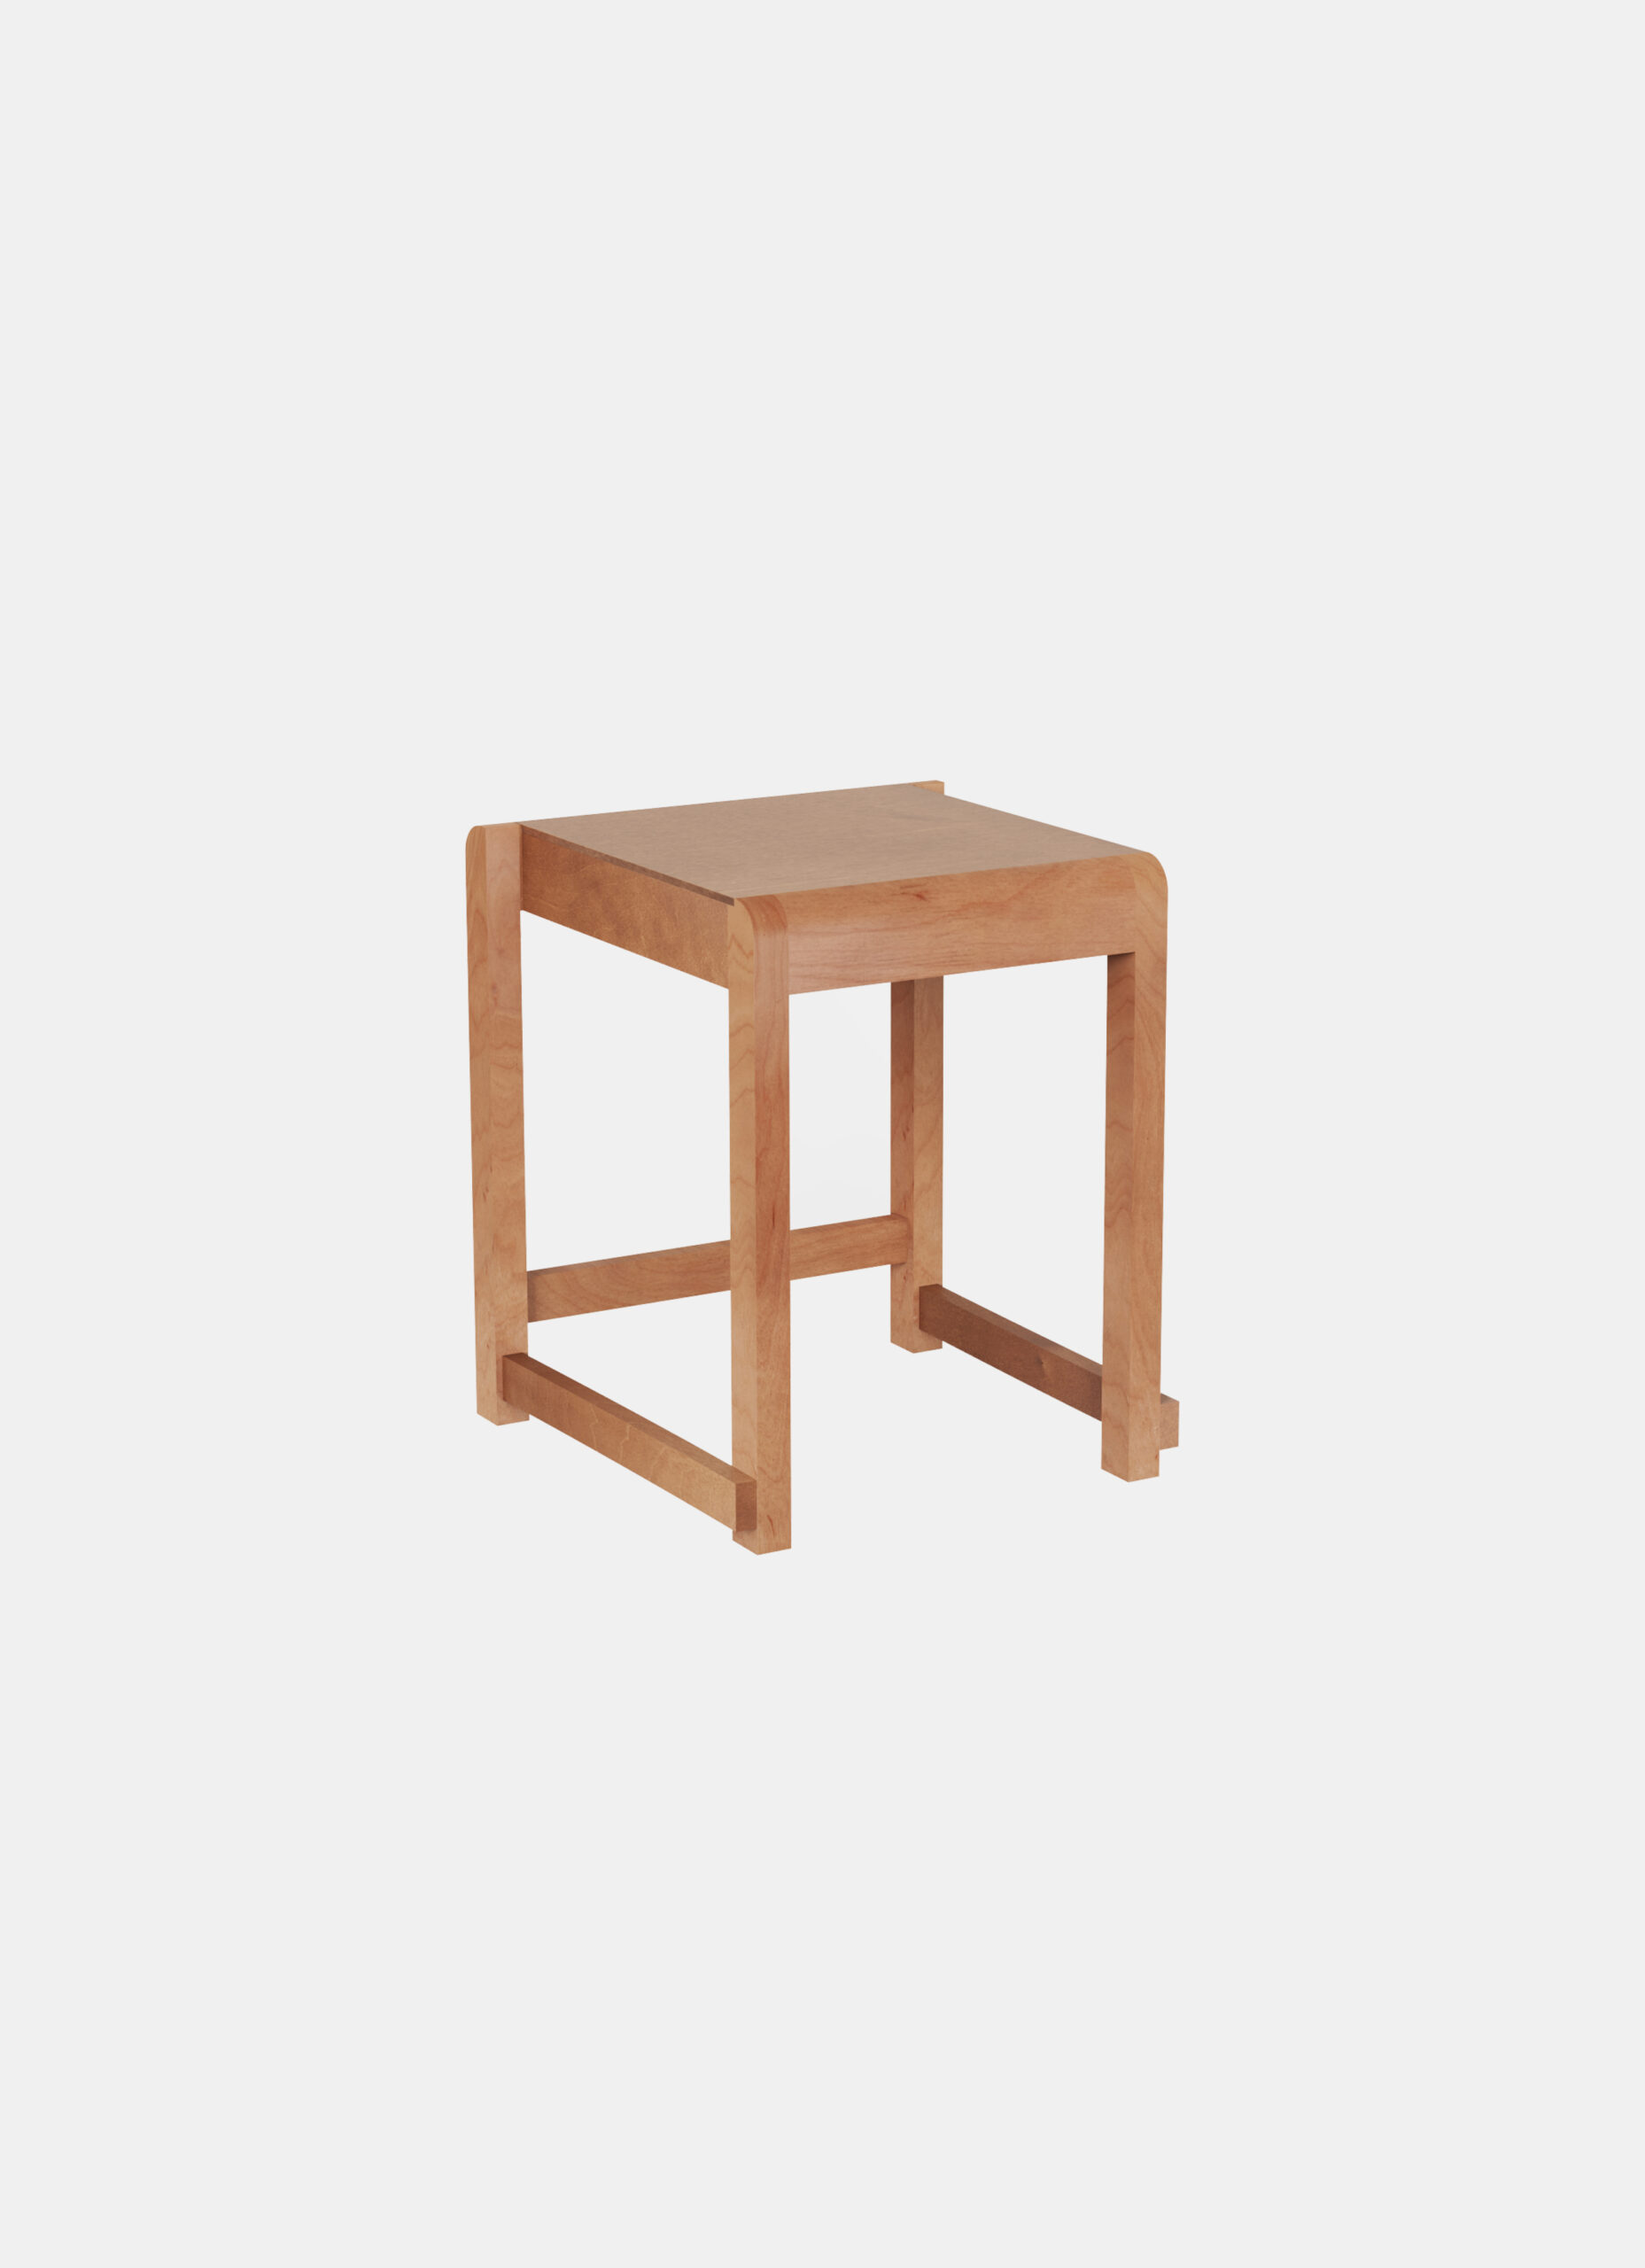 Frama - Low Stool 01 - Warm Brown Wood